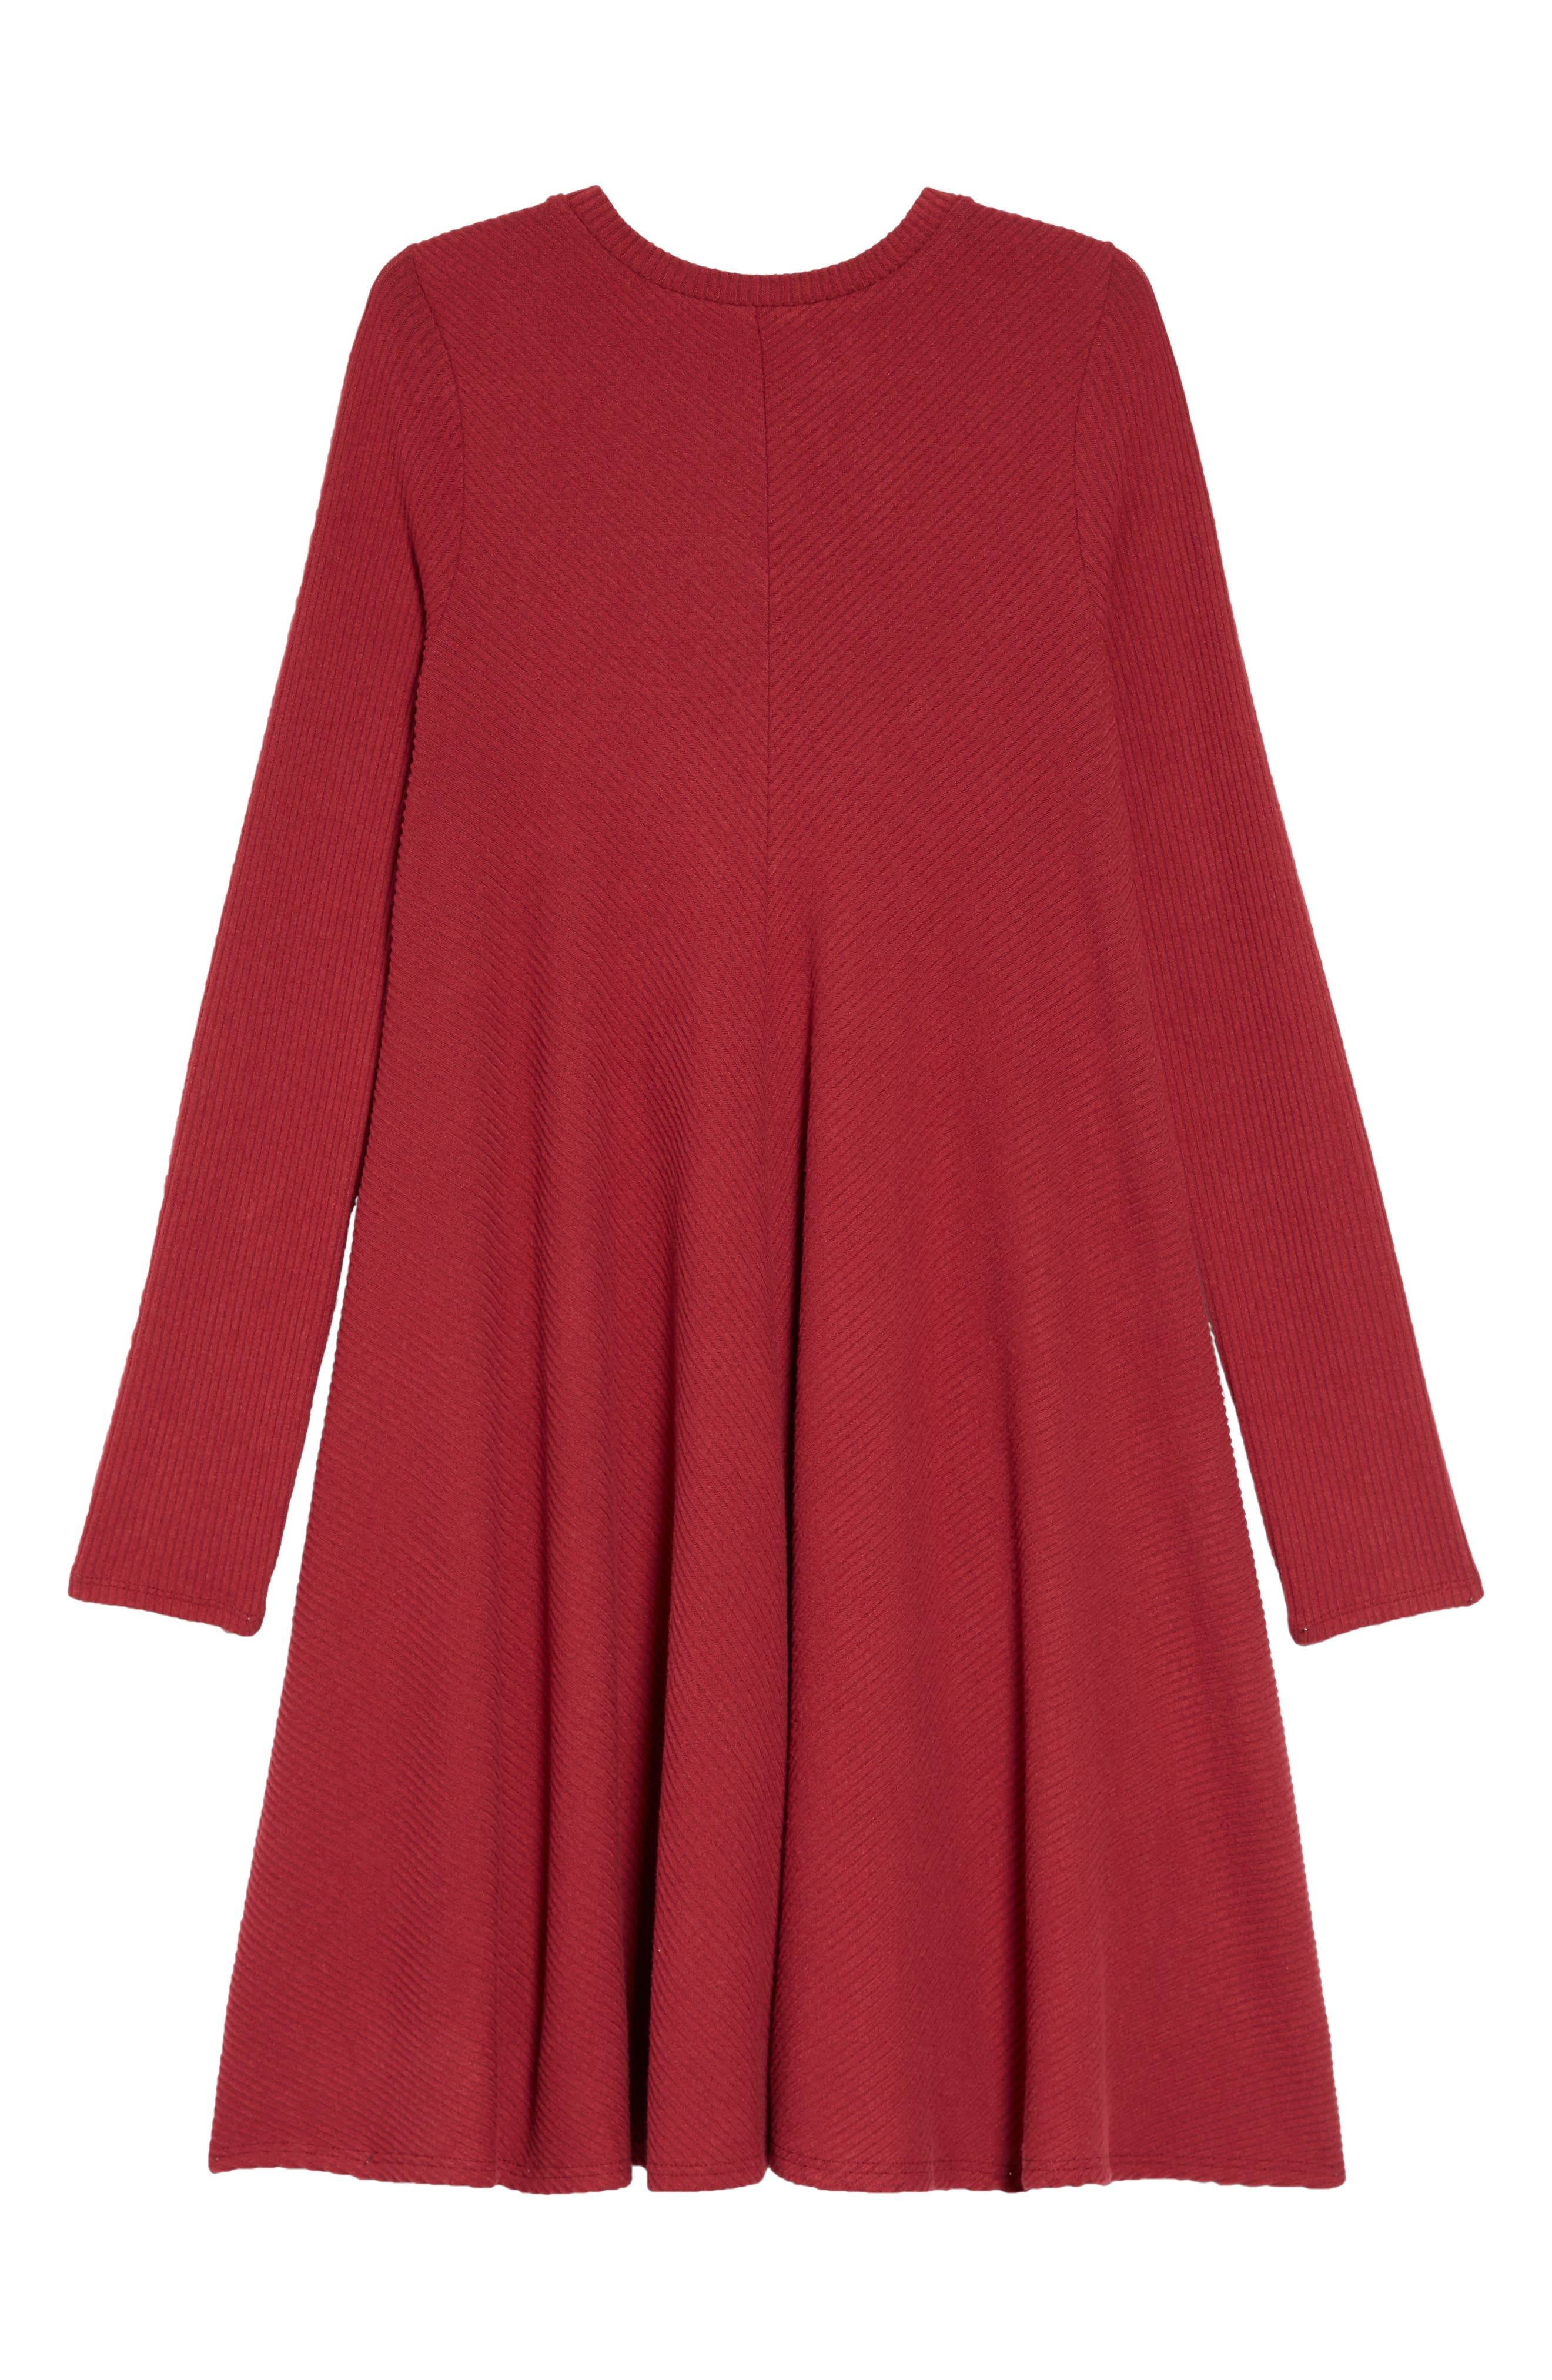 Tucker + Take Swing Dress,                             Main thumbnail 1, color,                             RED TIBETAN